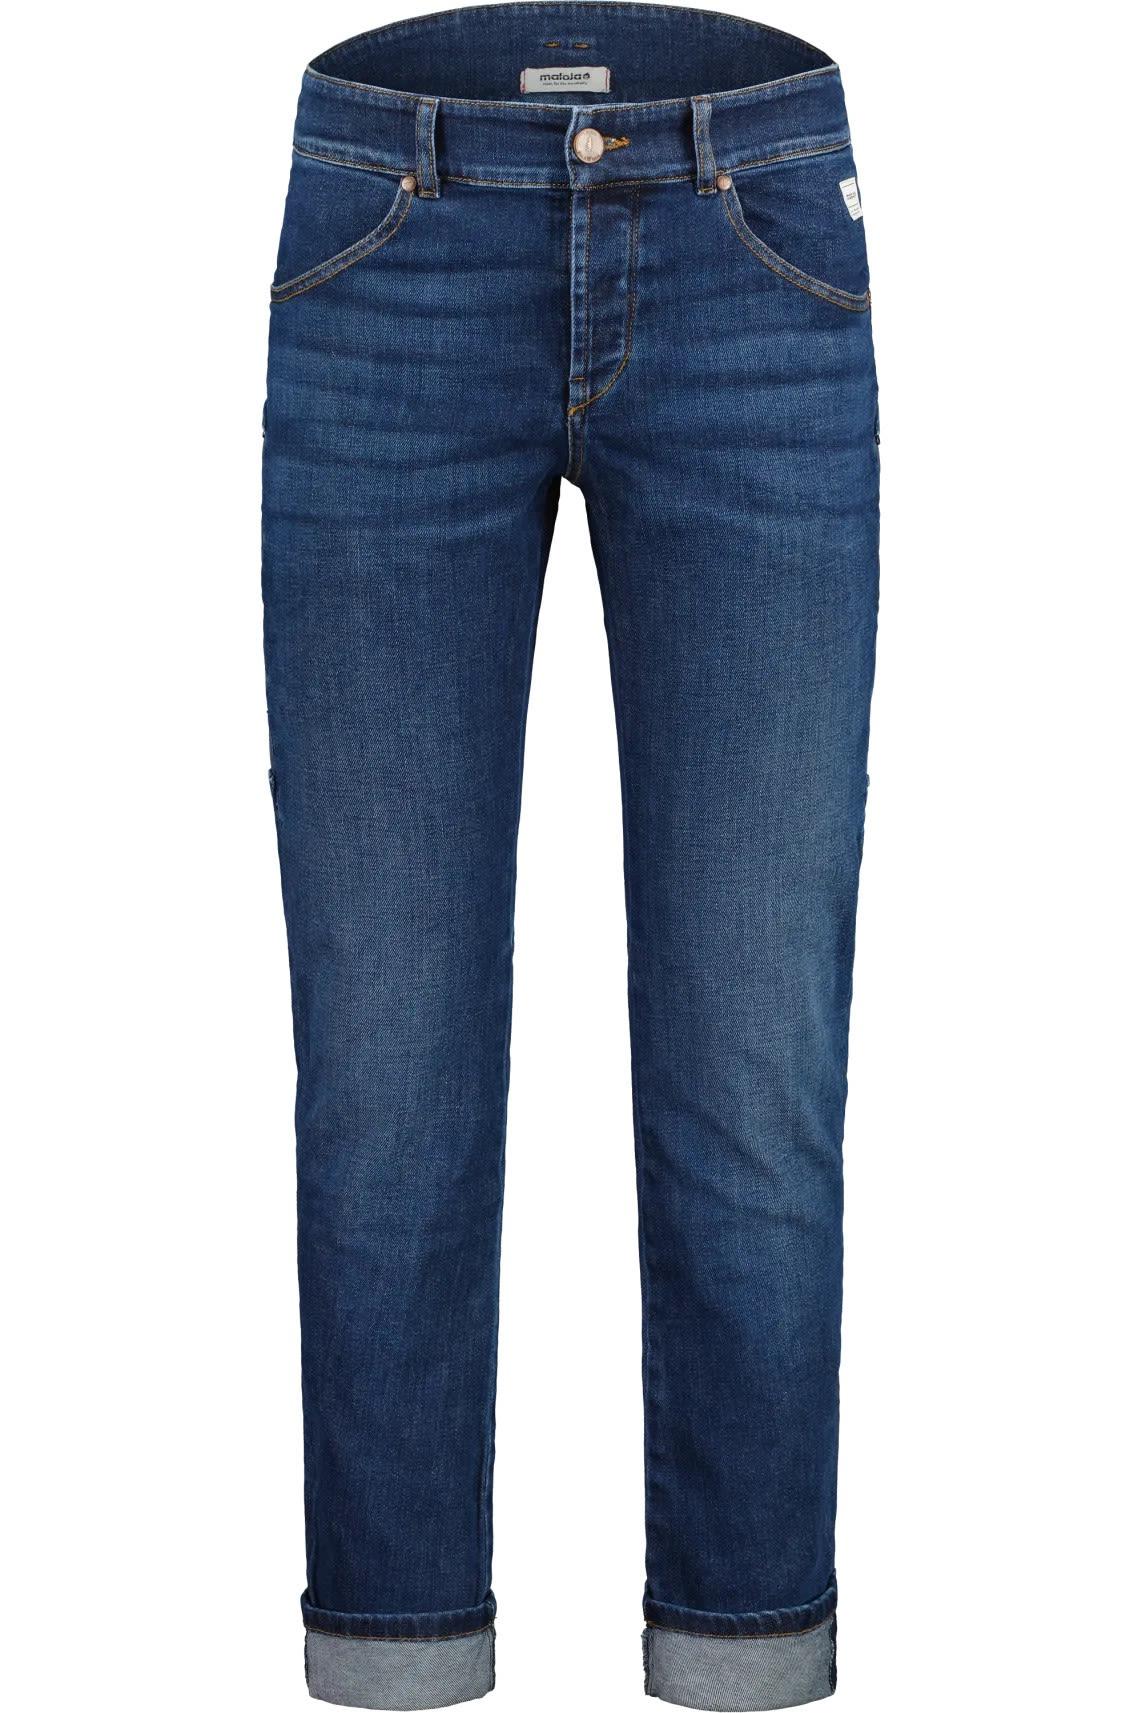 Maloja Blutwurzm. Jeans Blau, Male 32 -32 -Farbe Mountain Lake, 32 -32